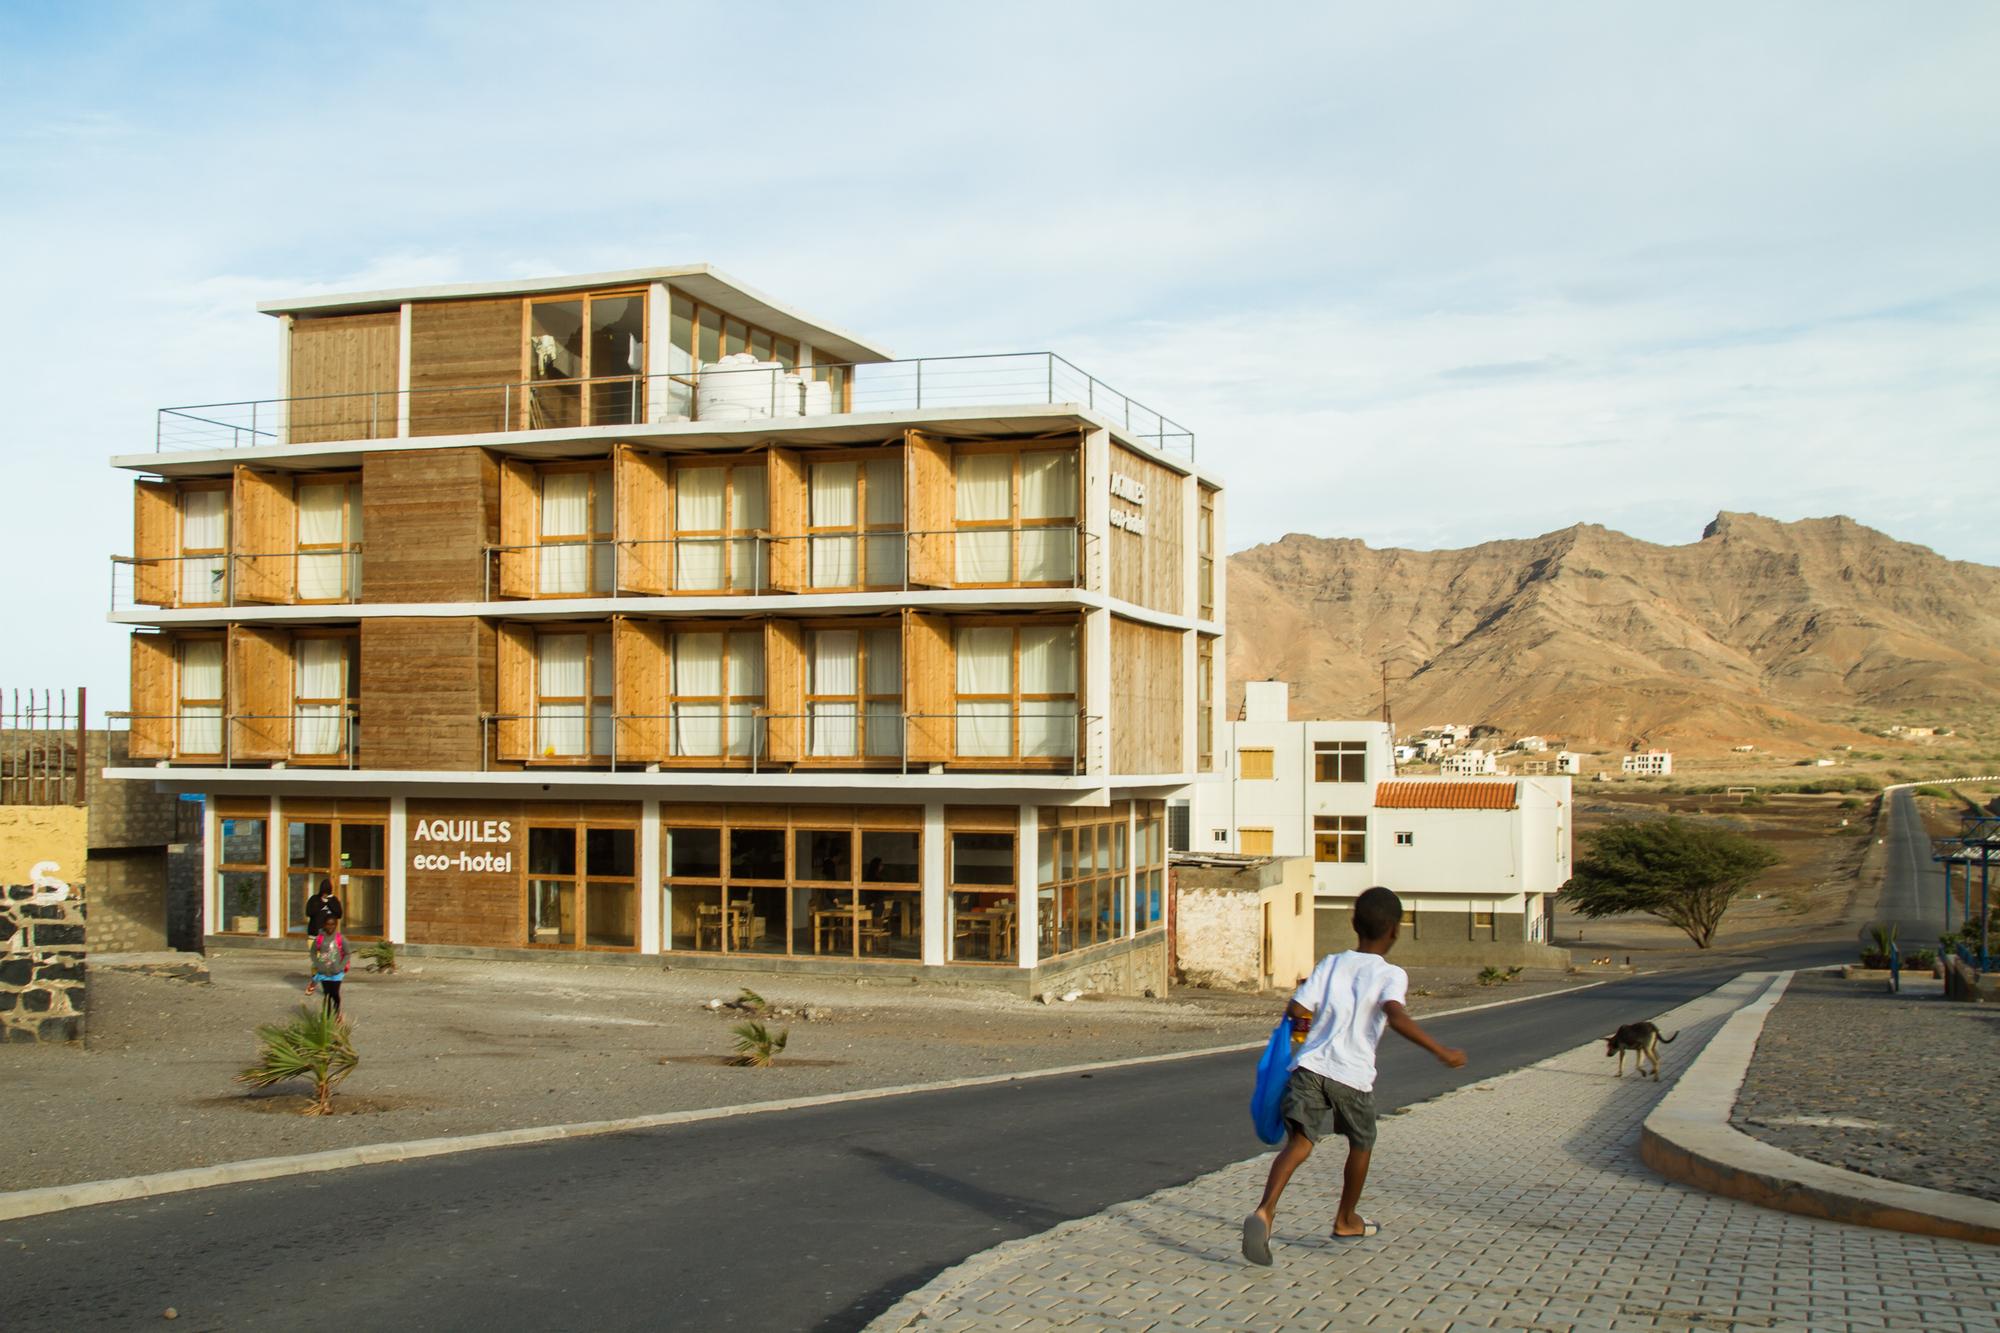 Gallery of aquiles eco hotel ramos castellano for Design merrion hotel 4